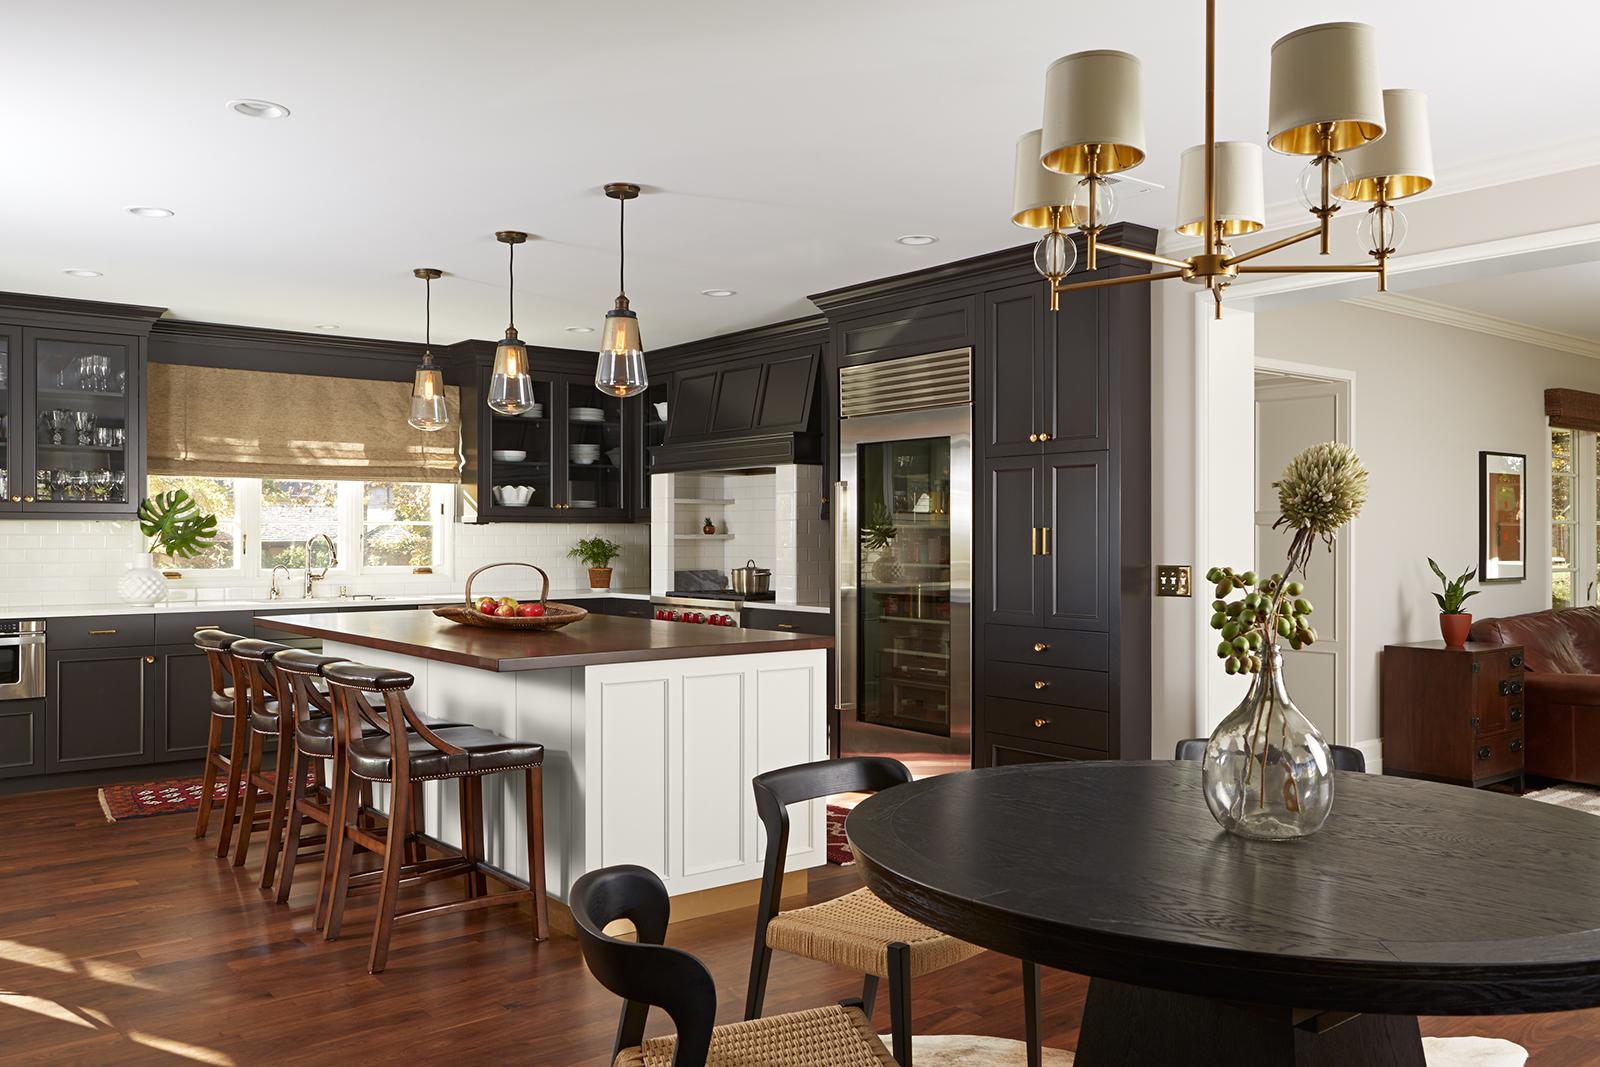 edina-kitchen-v1.jpg